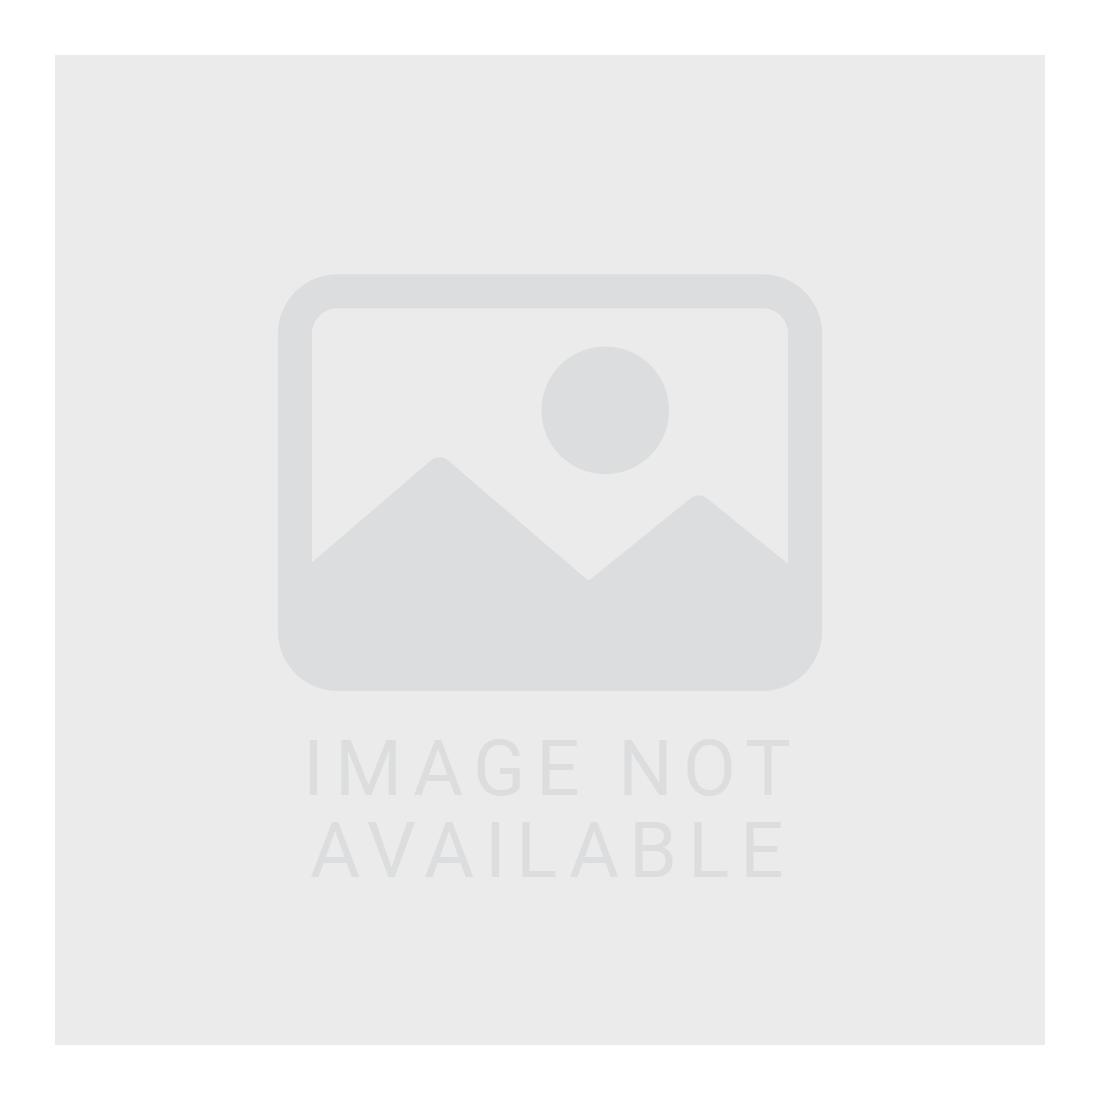 Hellcat Redeye Copper Vacuum Audio 22 oz Bottle